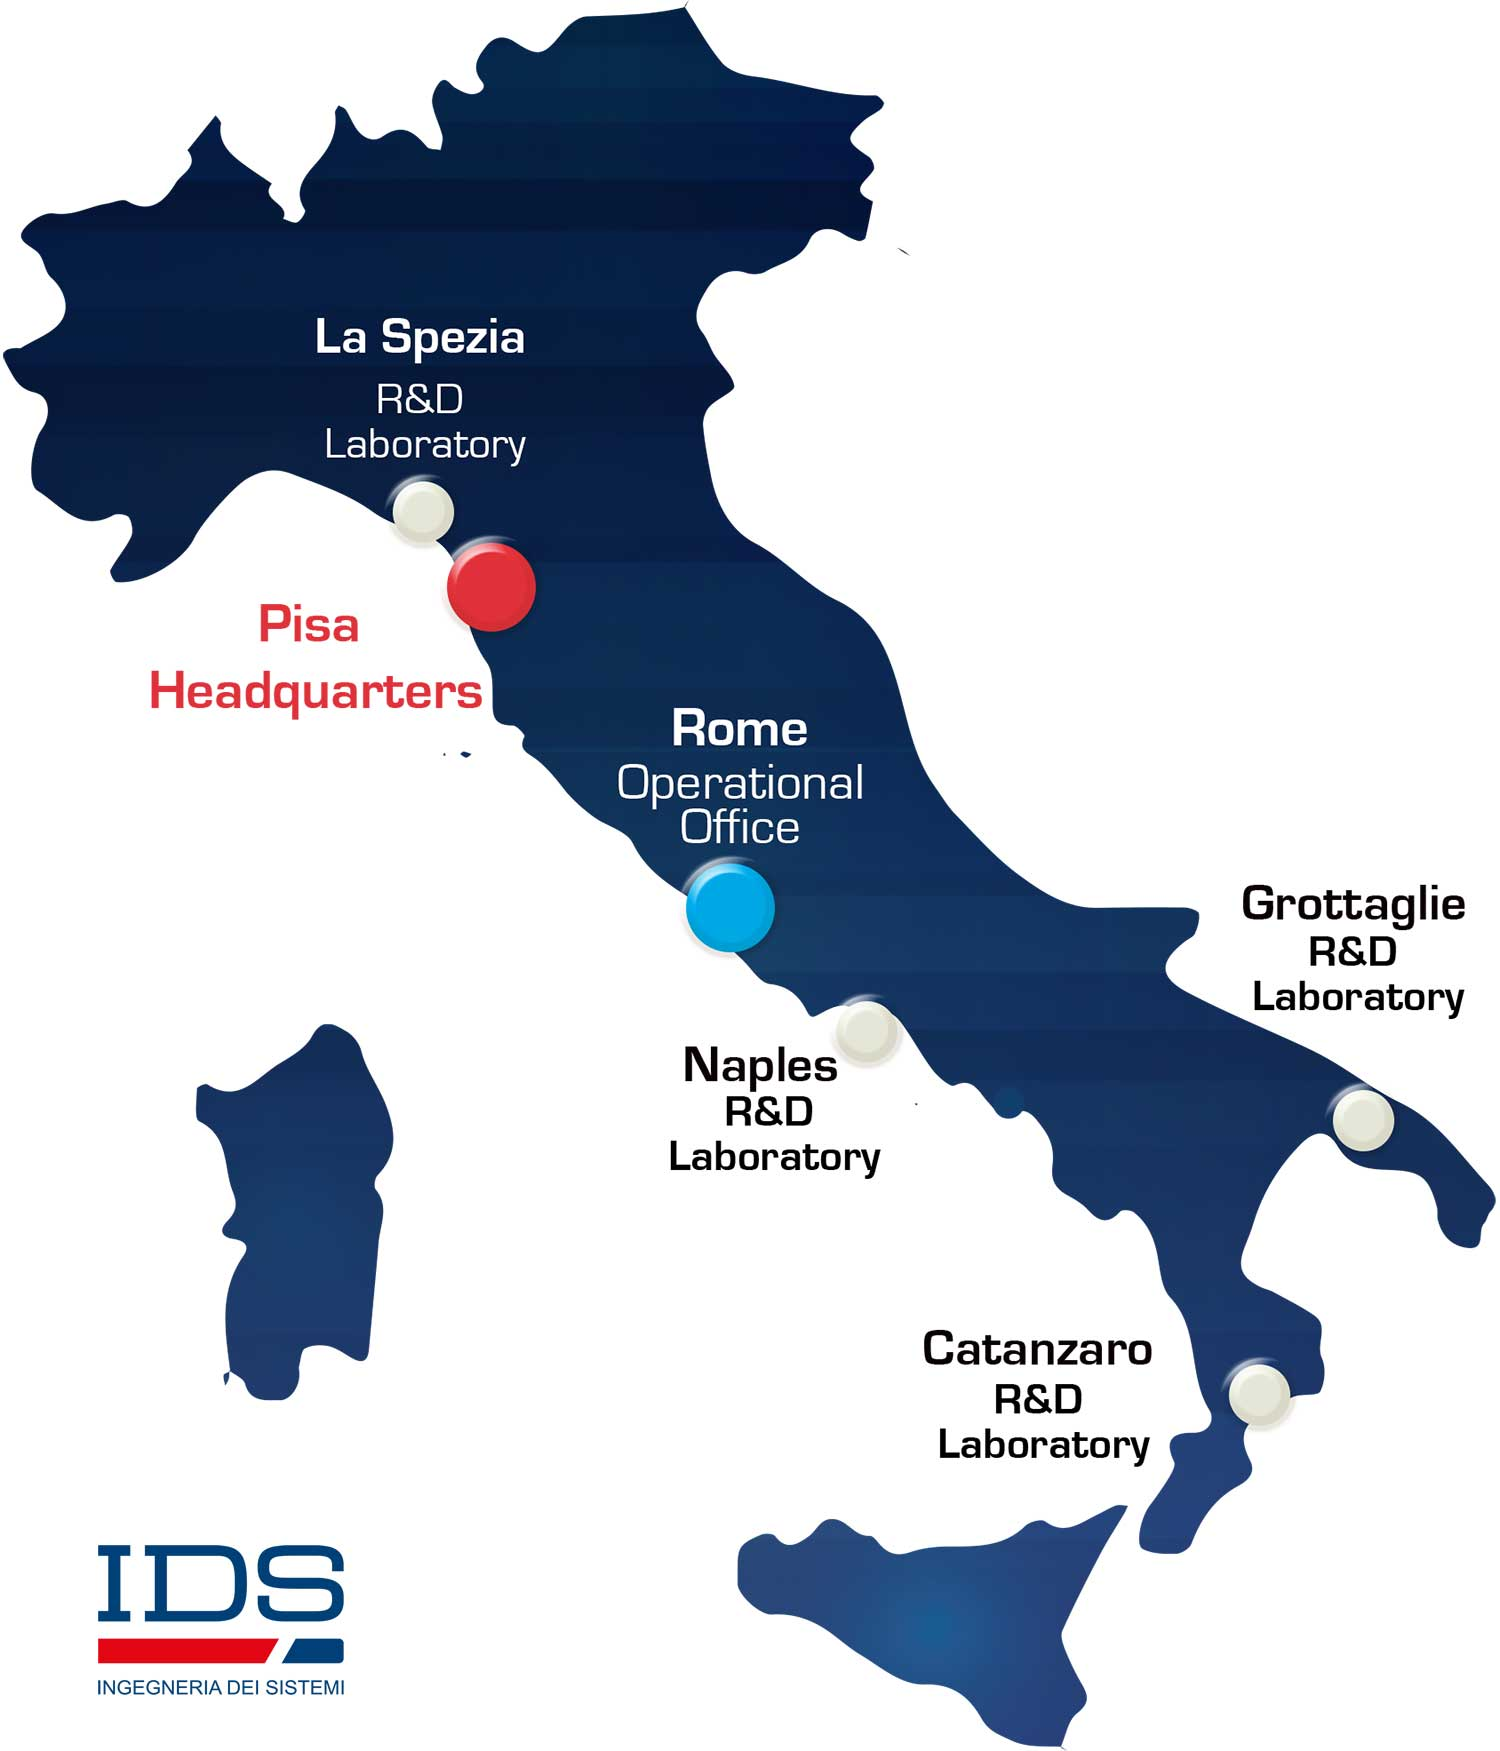 IDS Group